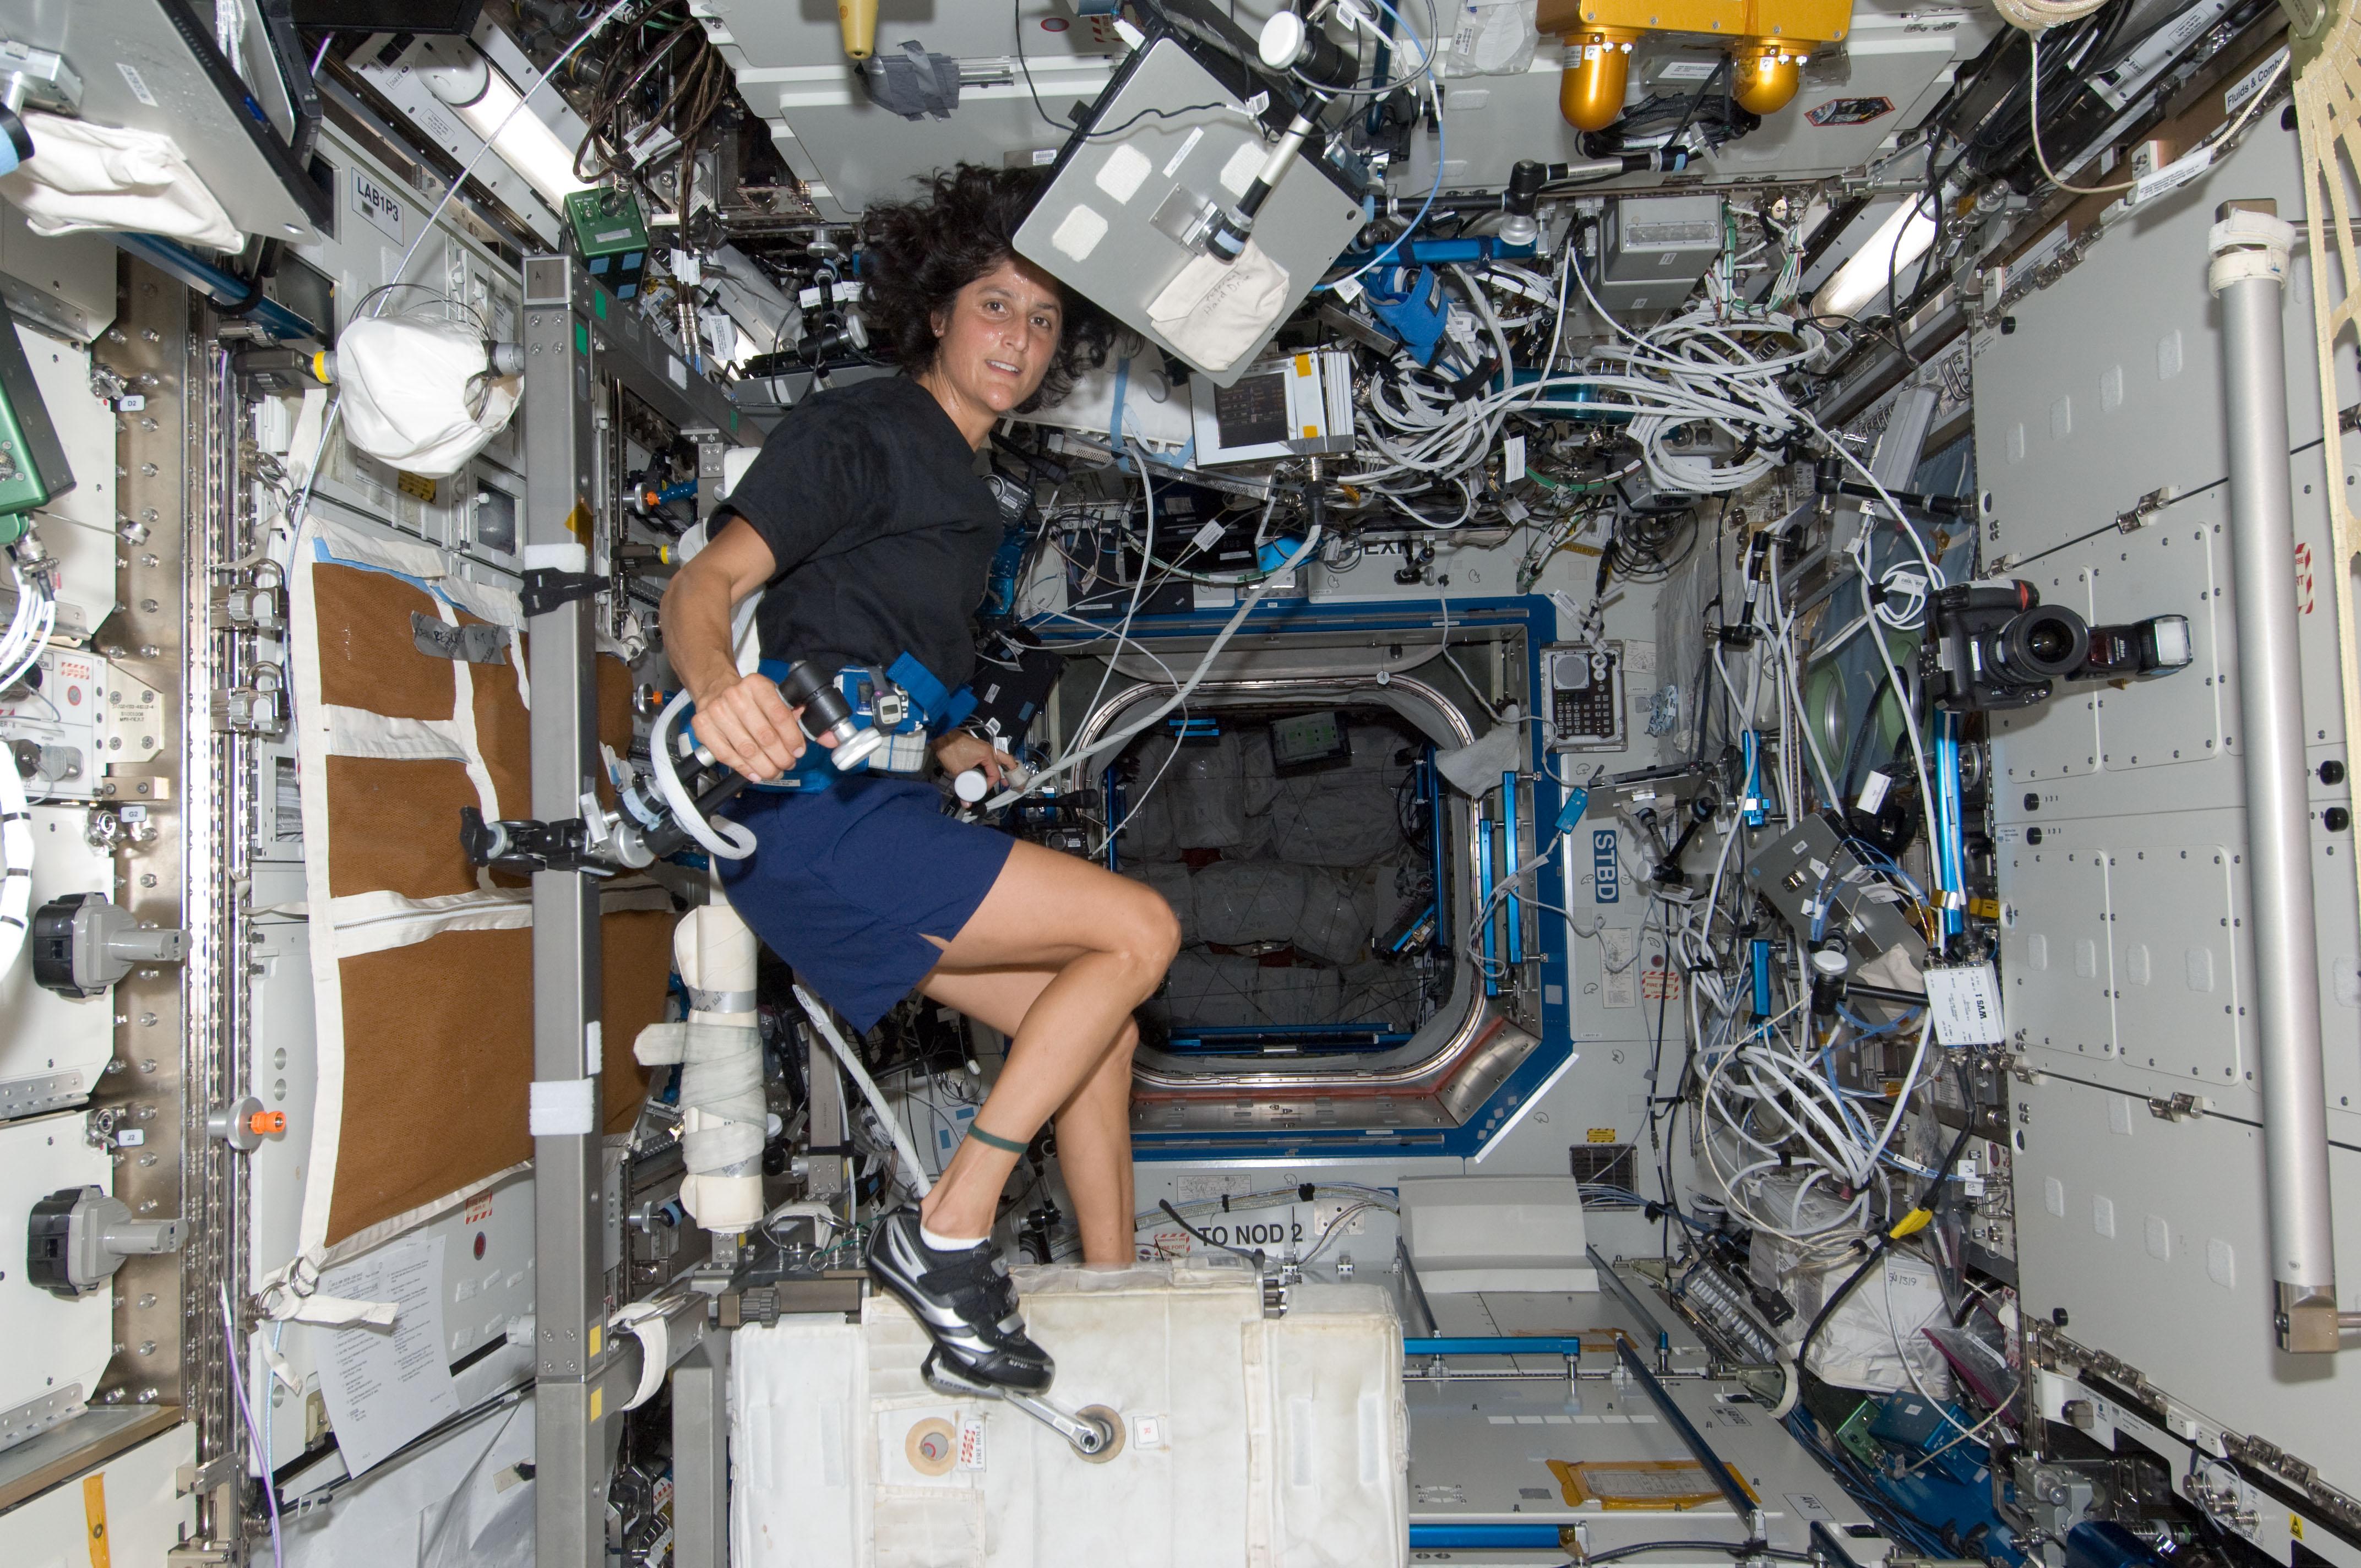 NASA - Expedition 32 Flight Engineer Sunita Williams